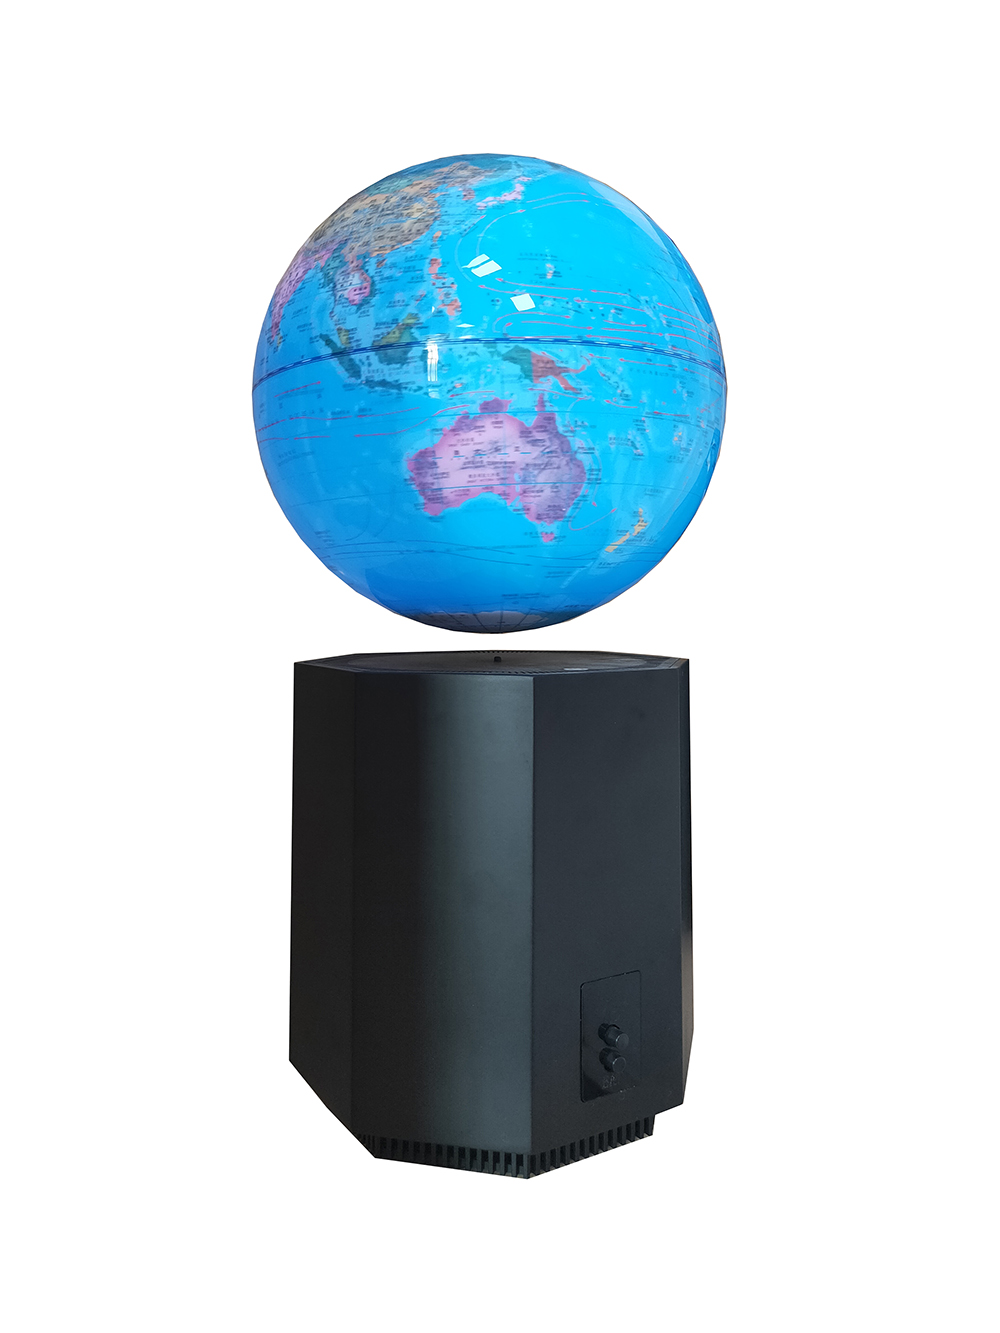 New Strange Gift Business Showing Room Office Desk Magnetic Levitation 8 Inch Earth Globe Auto Lifting Base   White LED Light